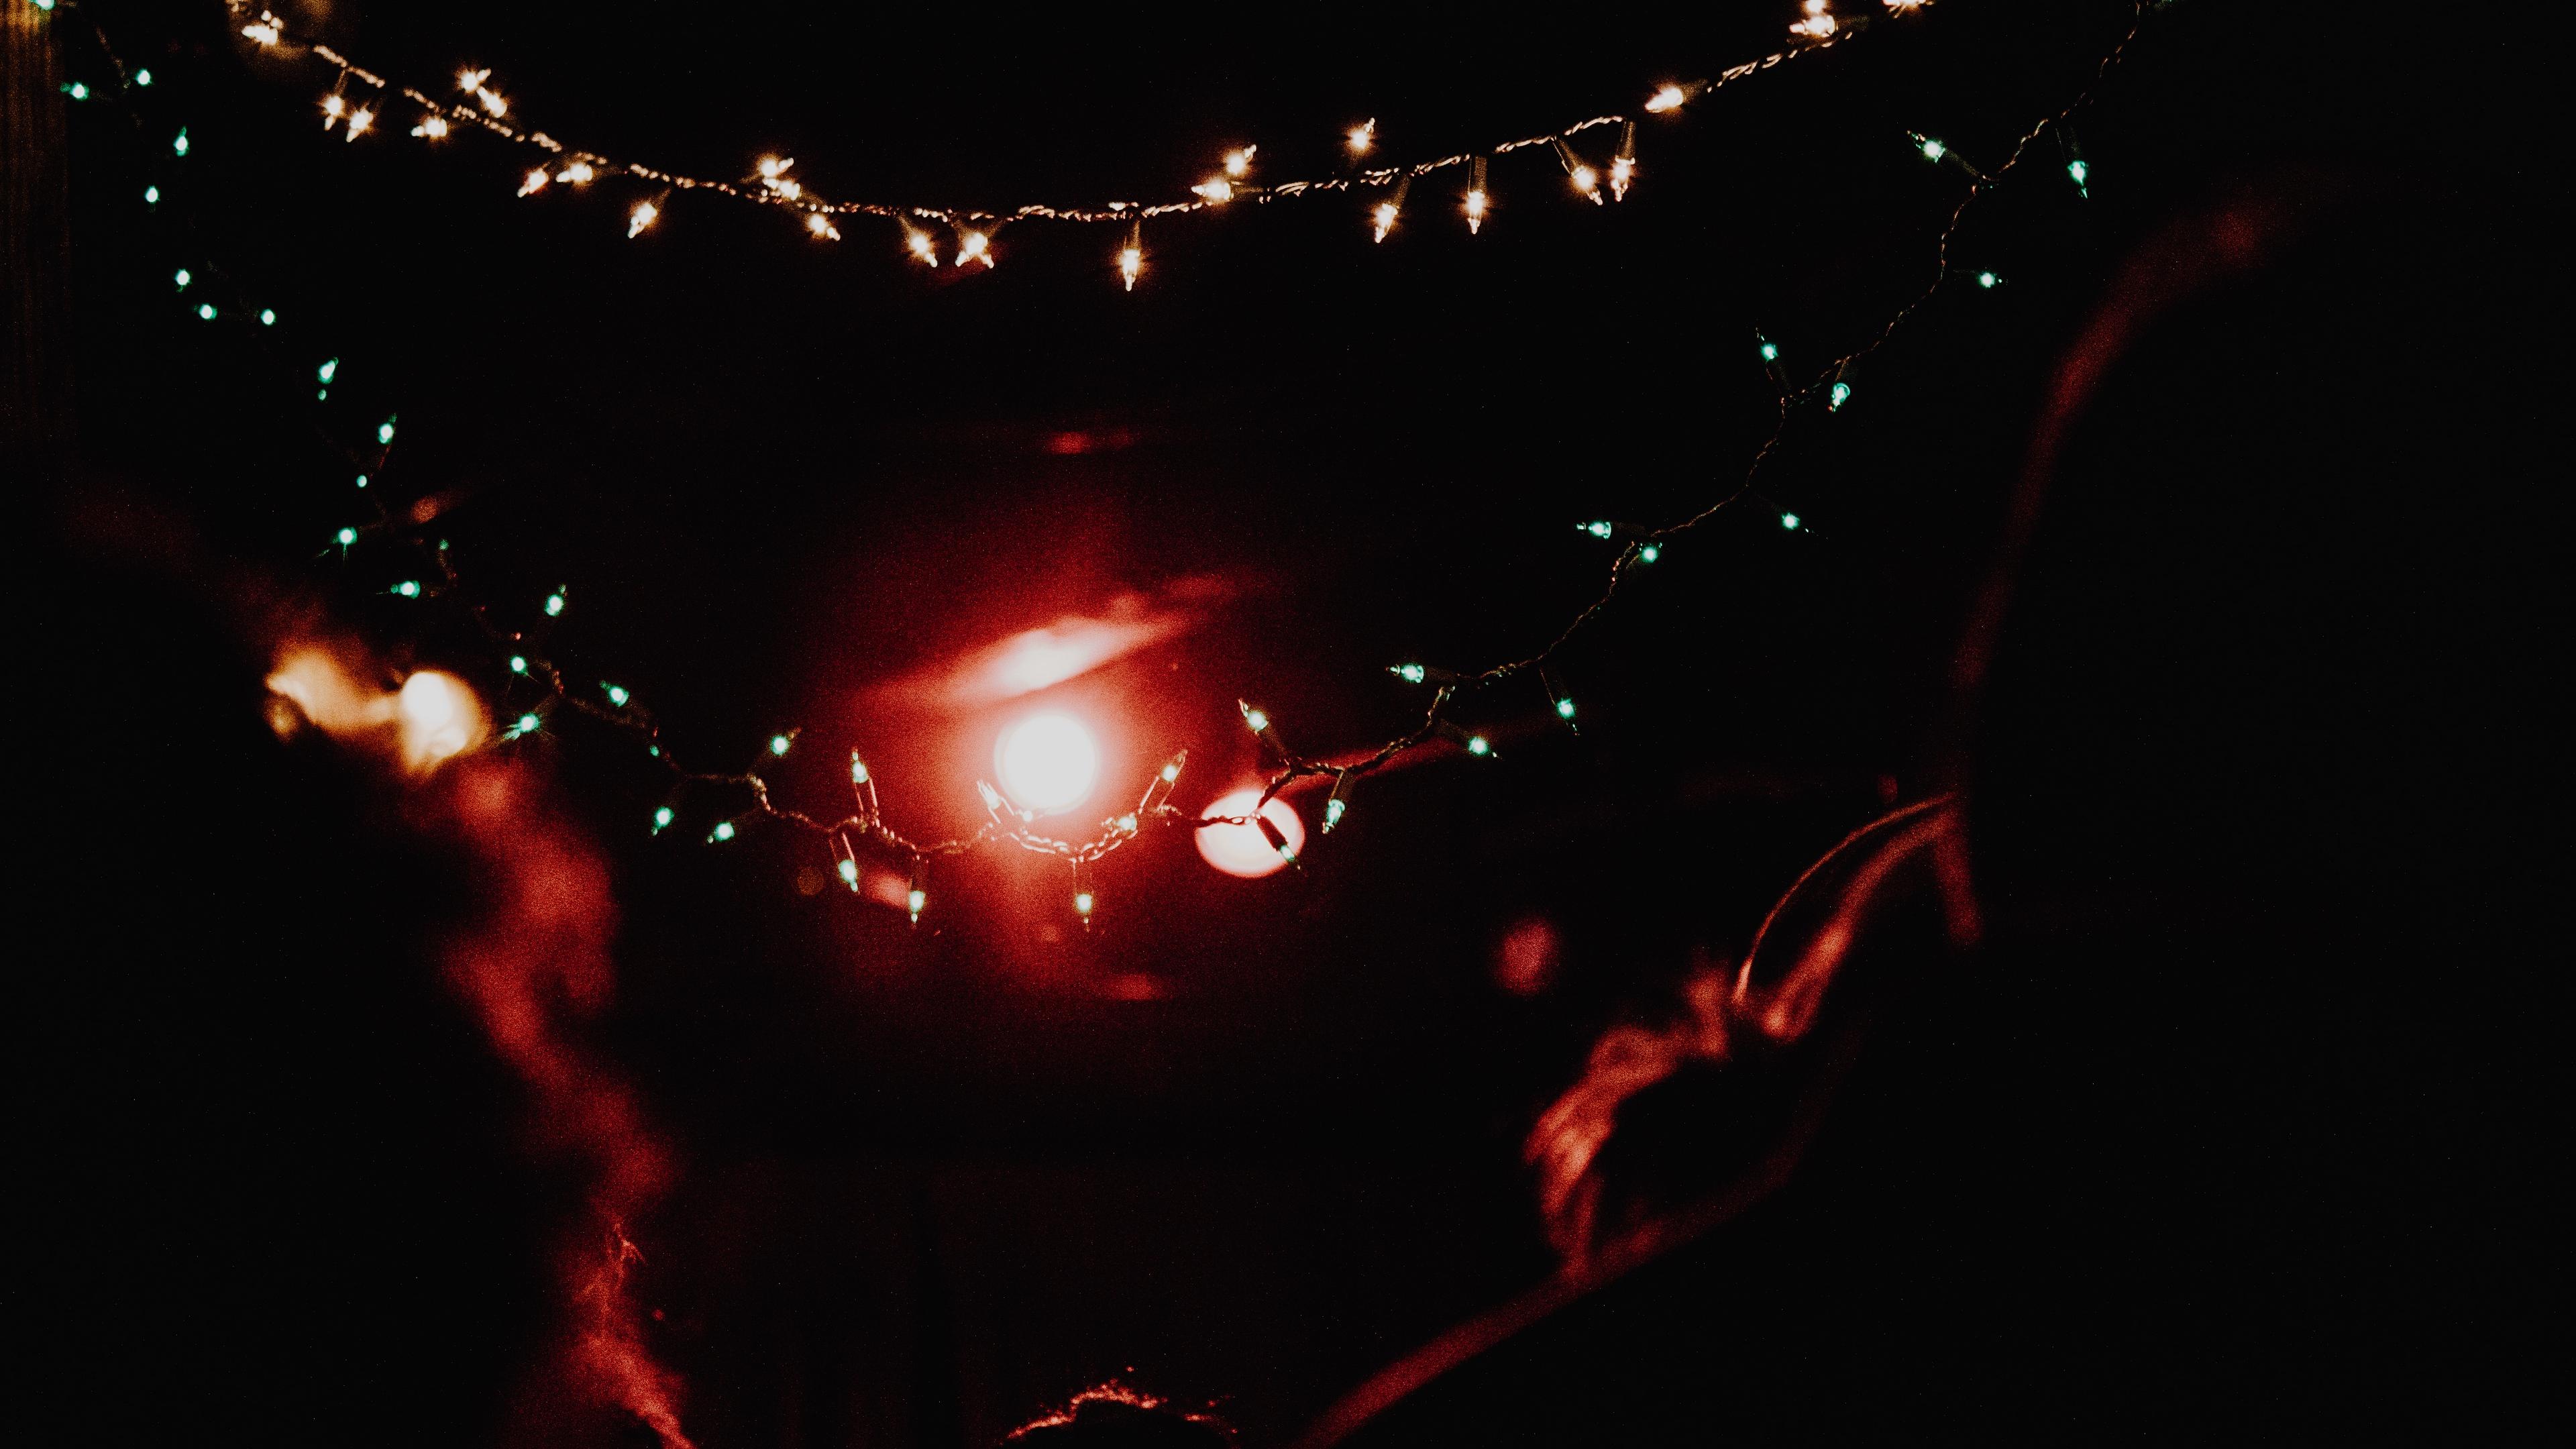 garland light glitter 4k 1540574496 - garland, light, glitter 4k - Light, Glitter, garland